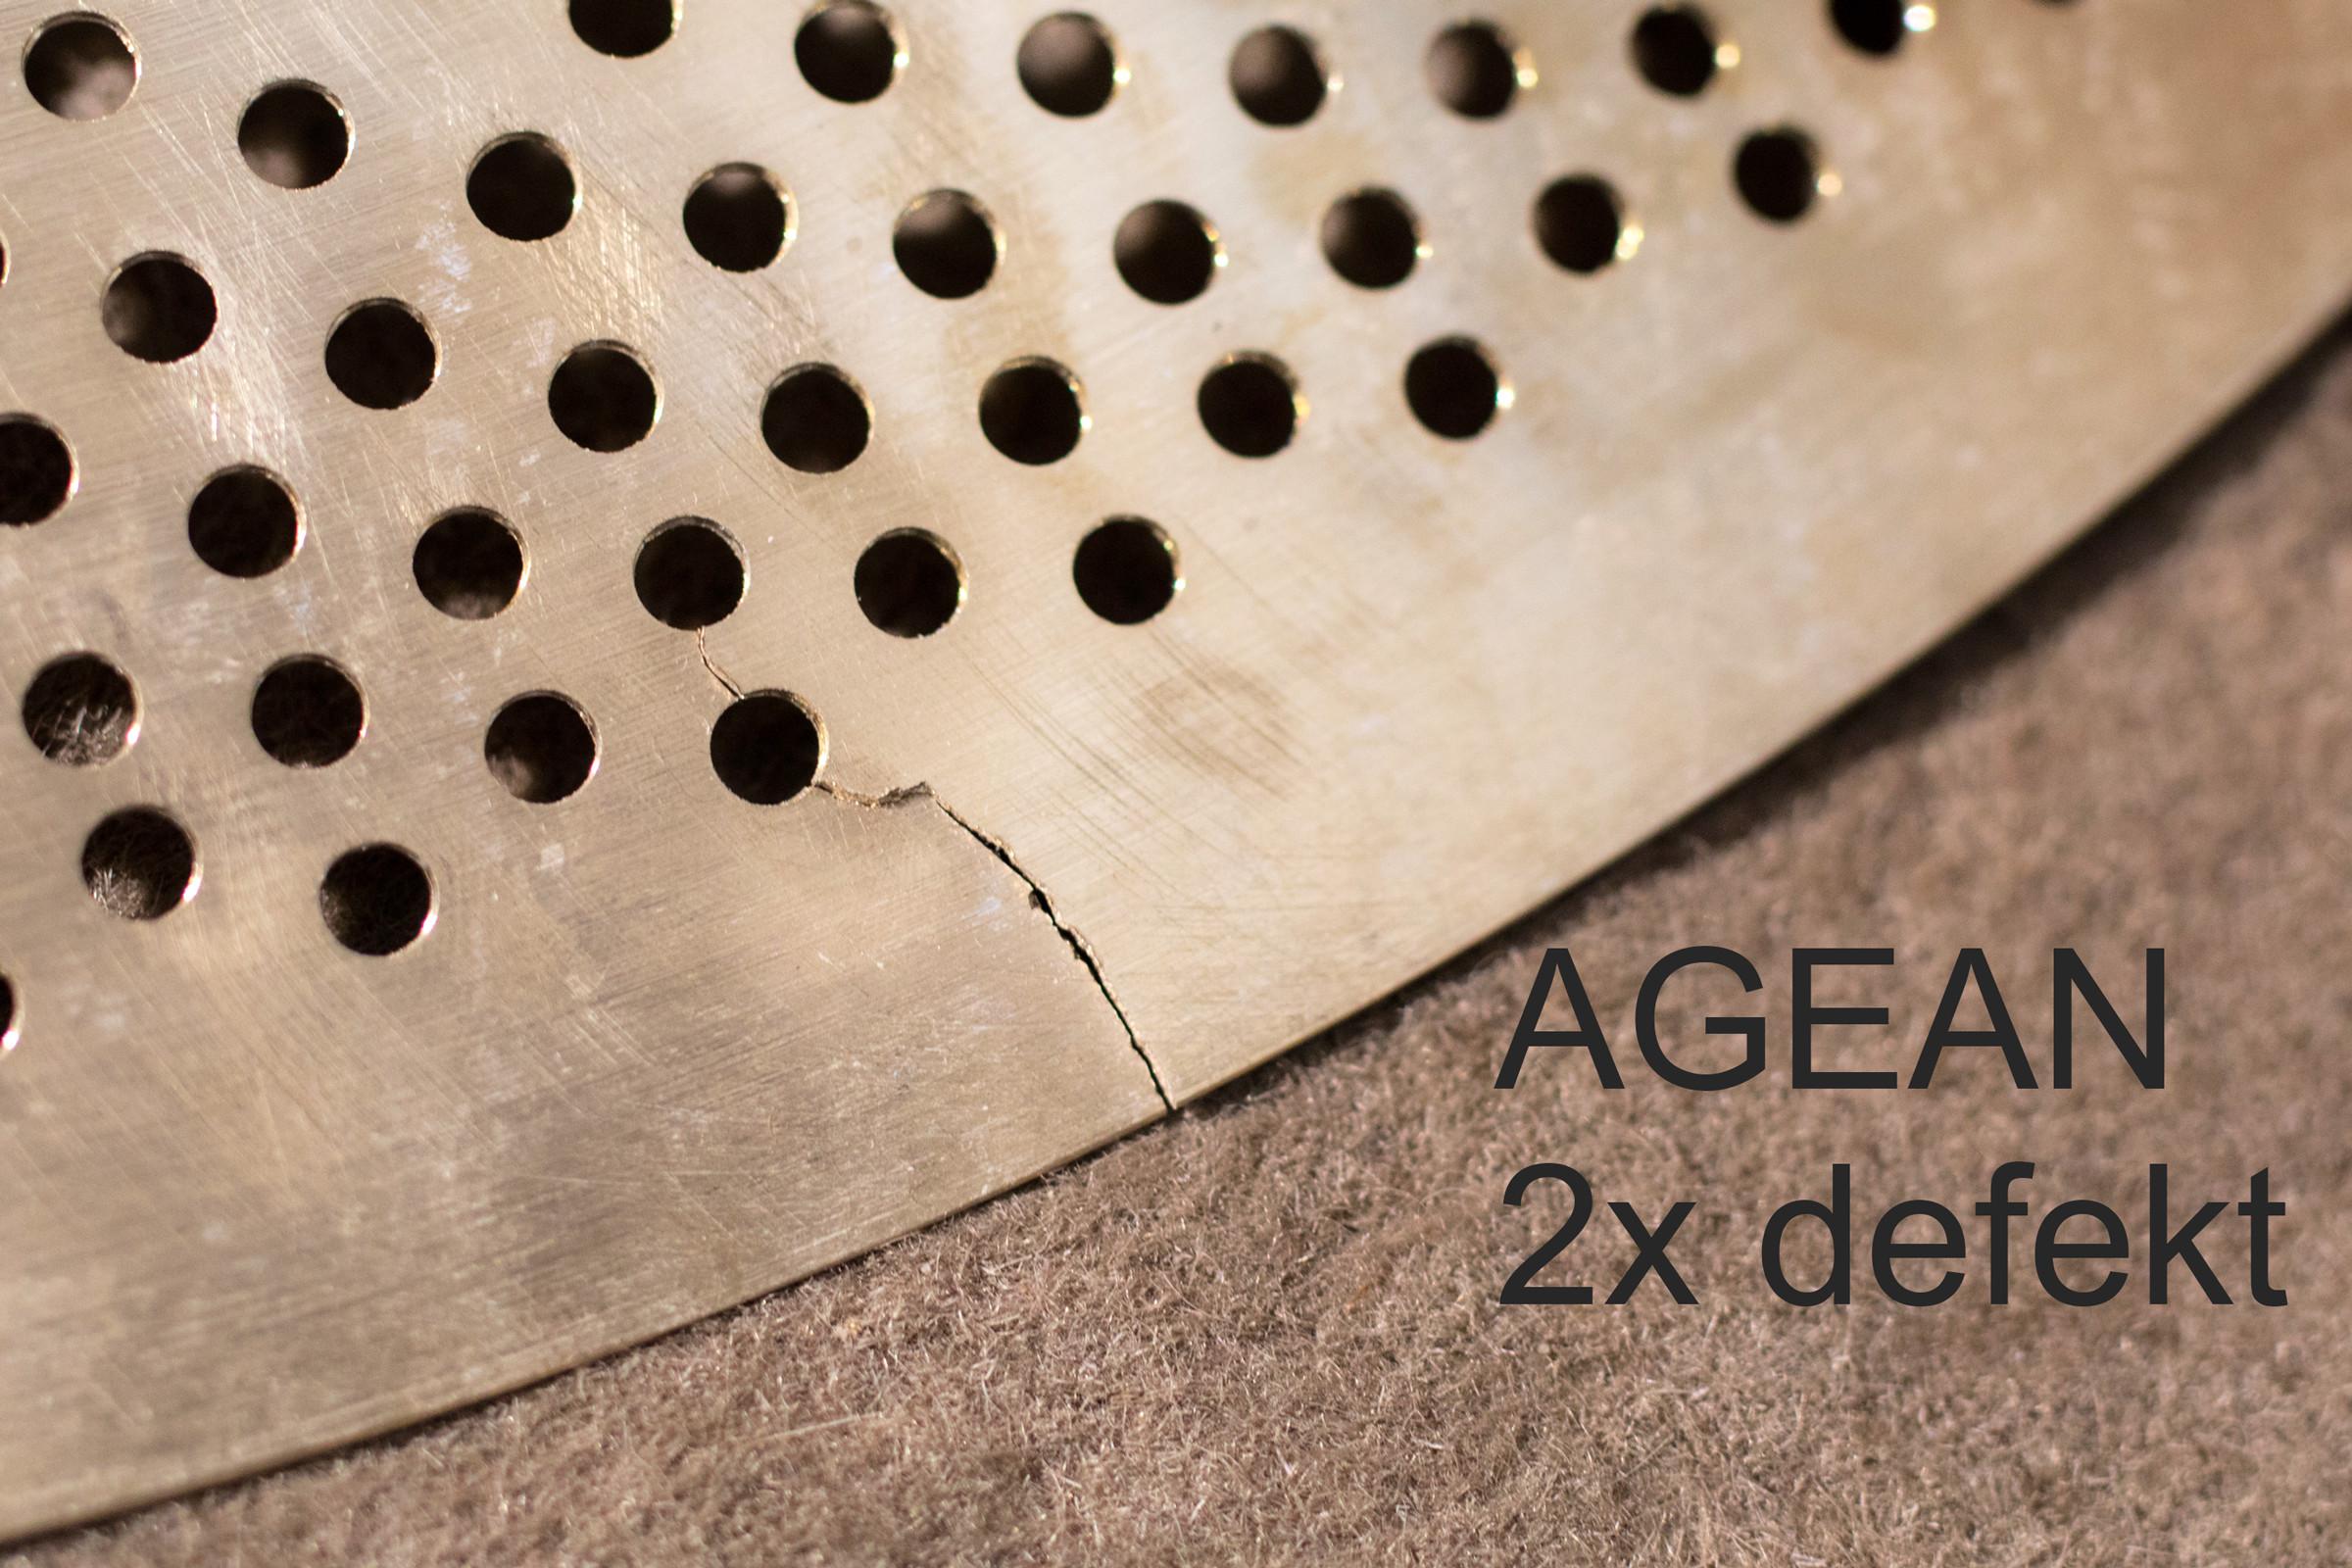 Agean cymbals defekt - Crash broken